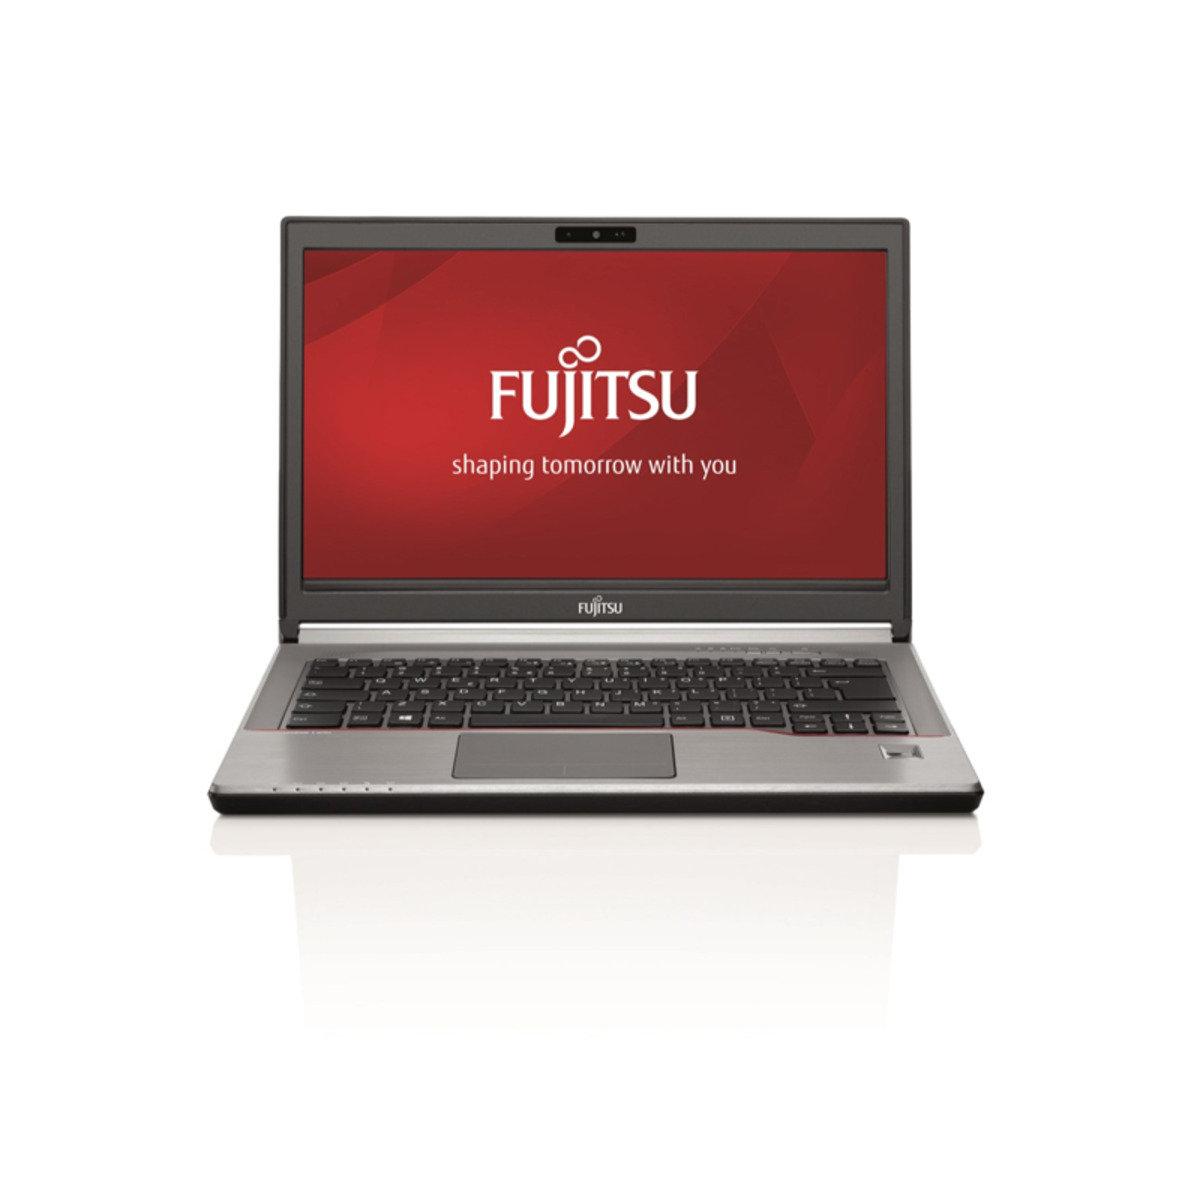 "Fujitsu Lifebook E744M13S 日本制造 Core i5 / 14.1"" (1600 x900)/ WIn 8.1"